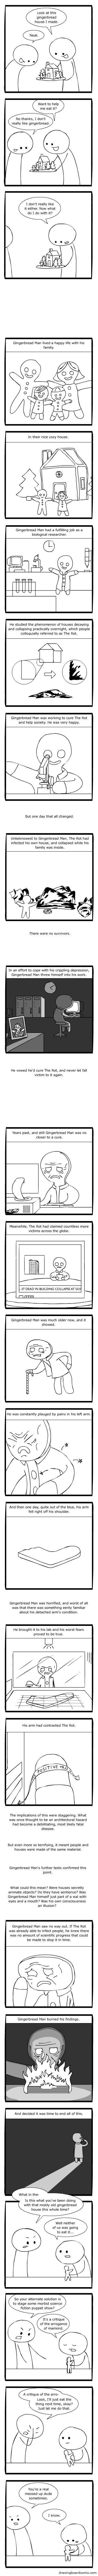 Gingerbread Man: The Movie - Album on Imgur